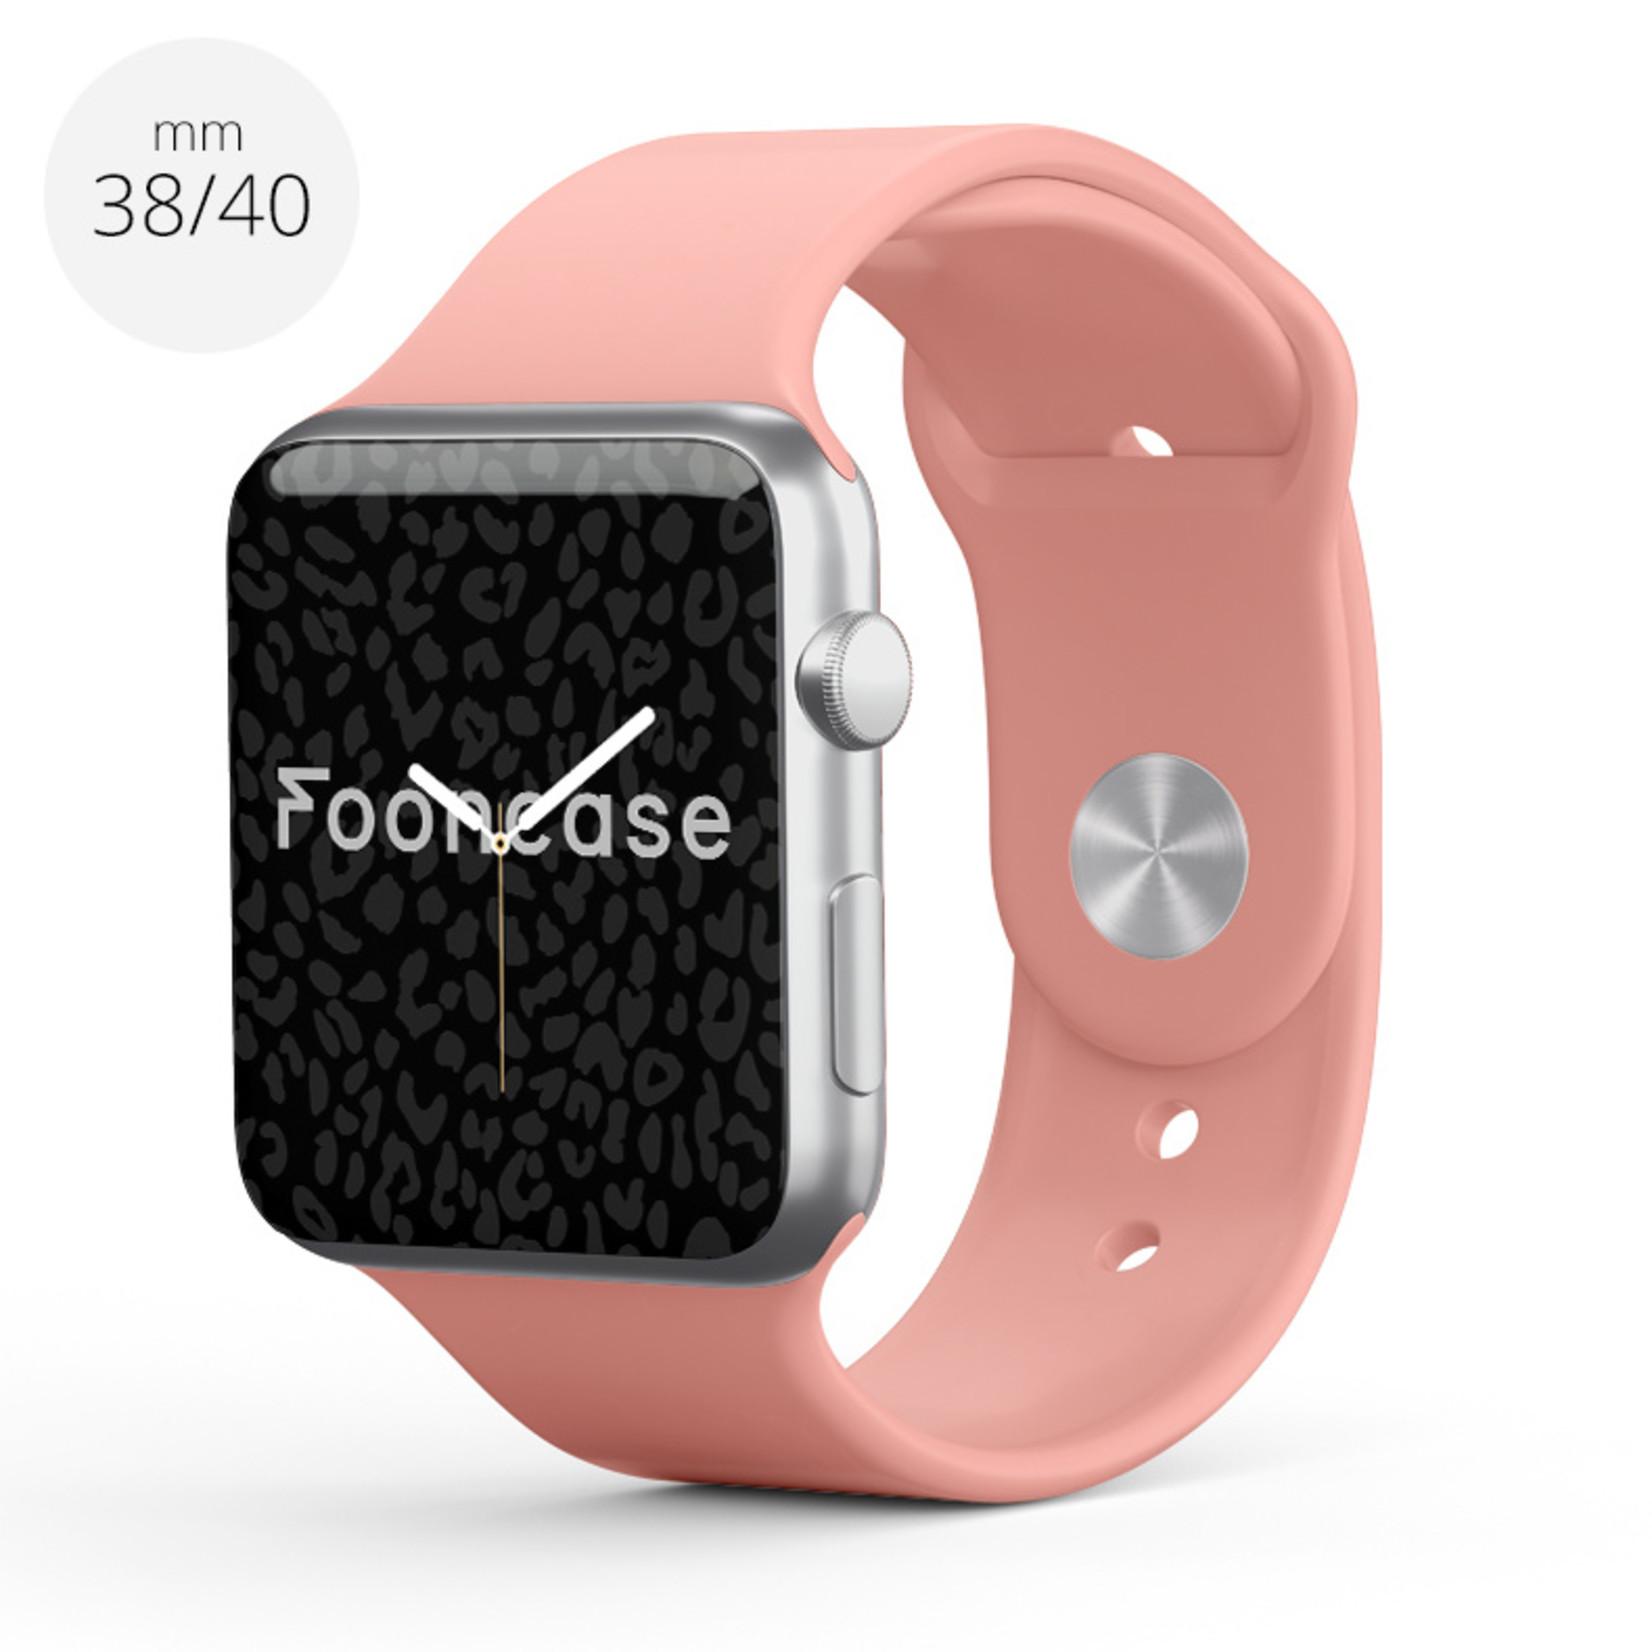 FOONCASE Apple Watch Series (1 t/m 6 / SE) - Peach - 38/40mm